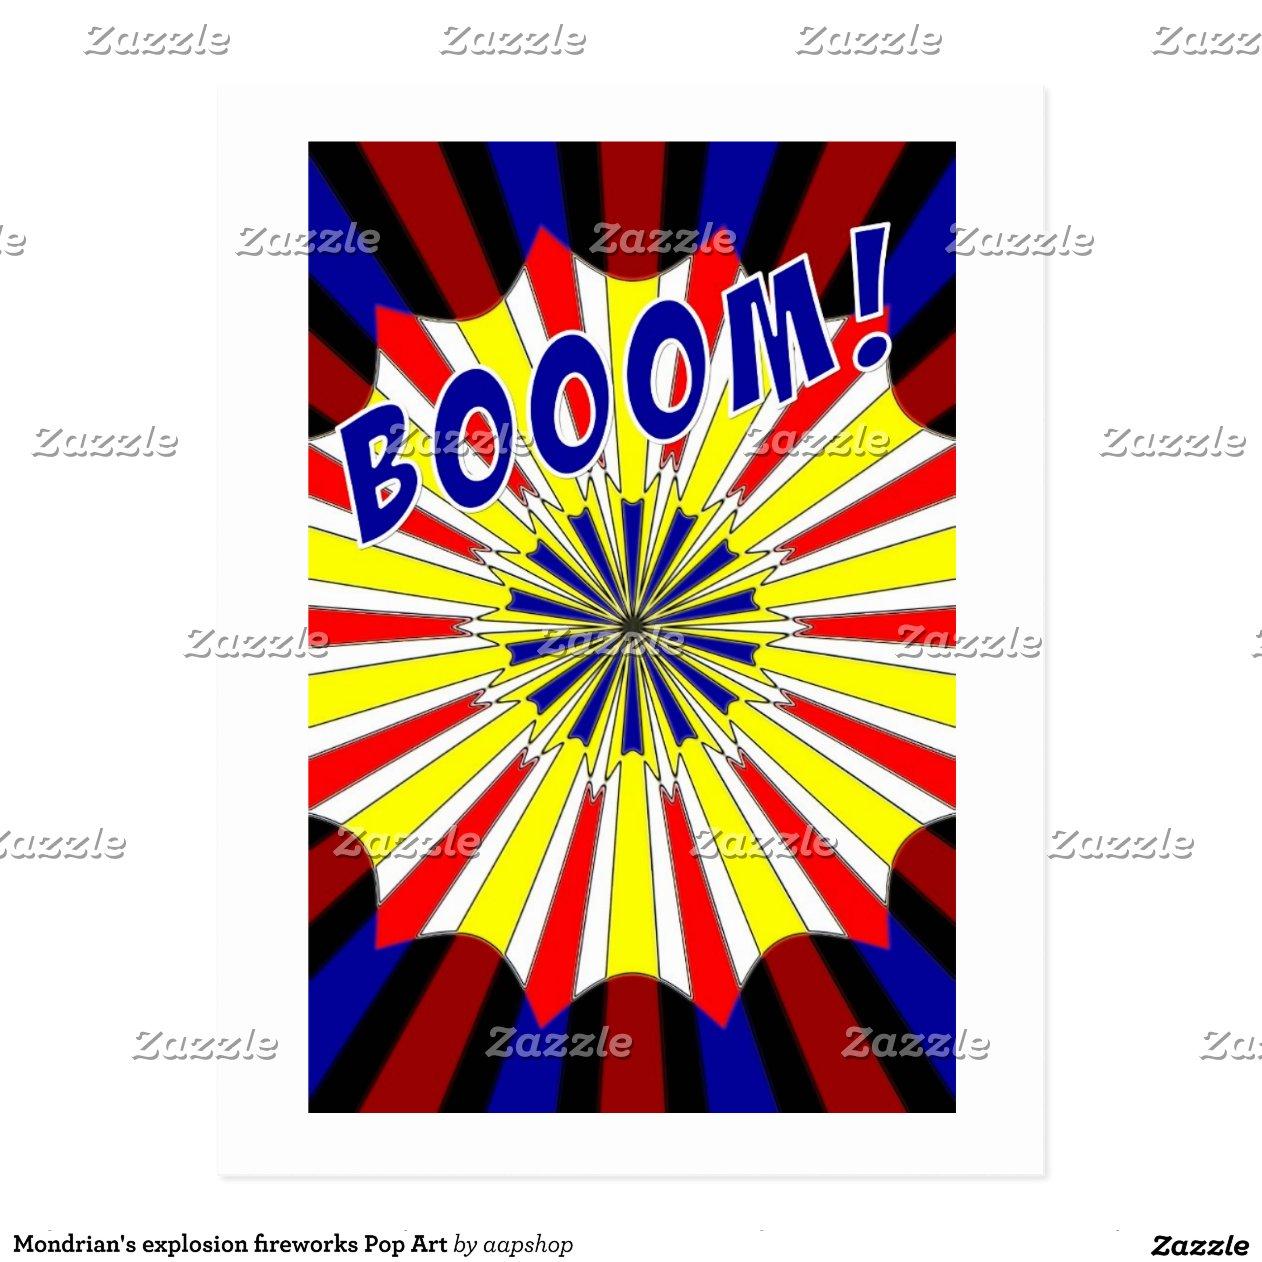 Mondrian's explosion fireworks Pop Art | Zazzle